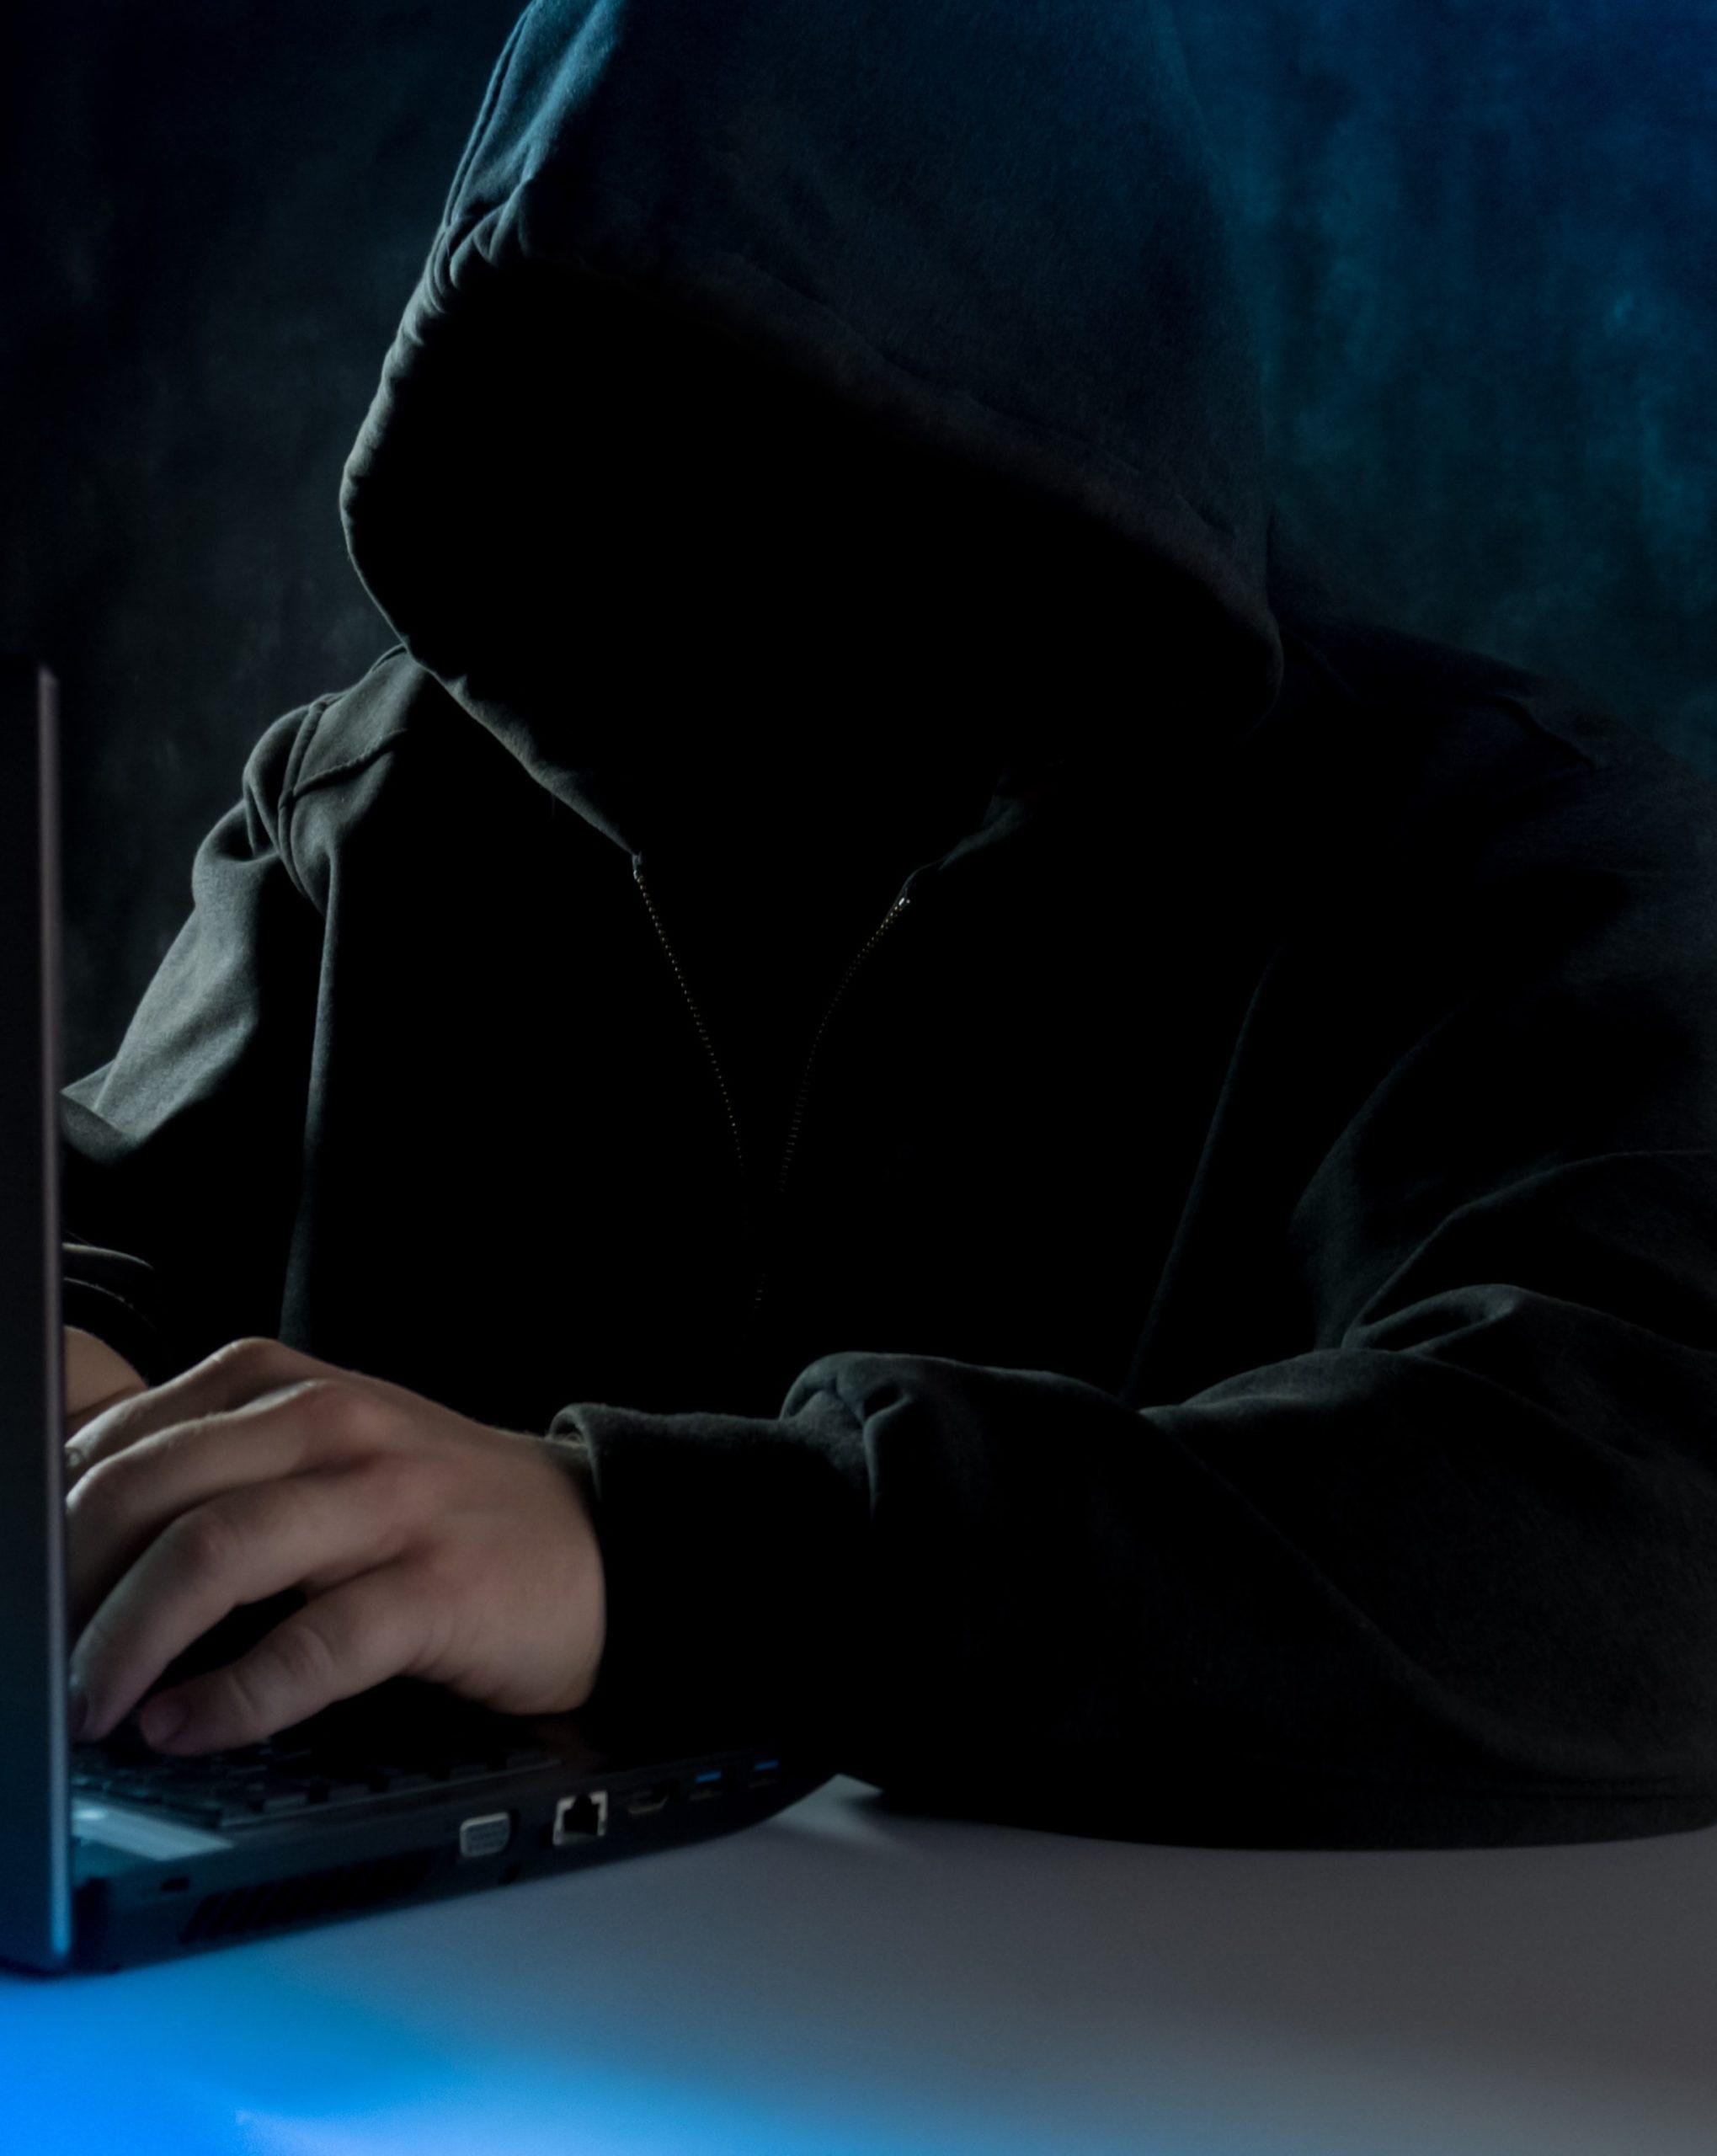 How to Identify ID Fraud